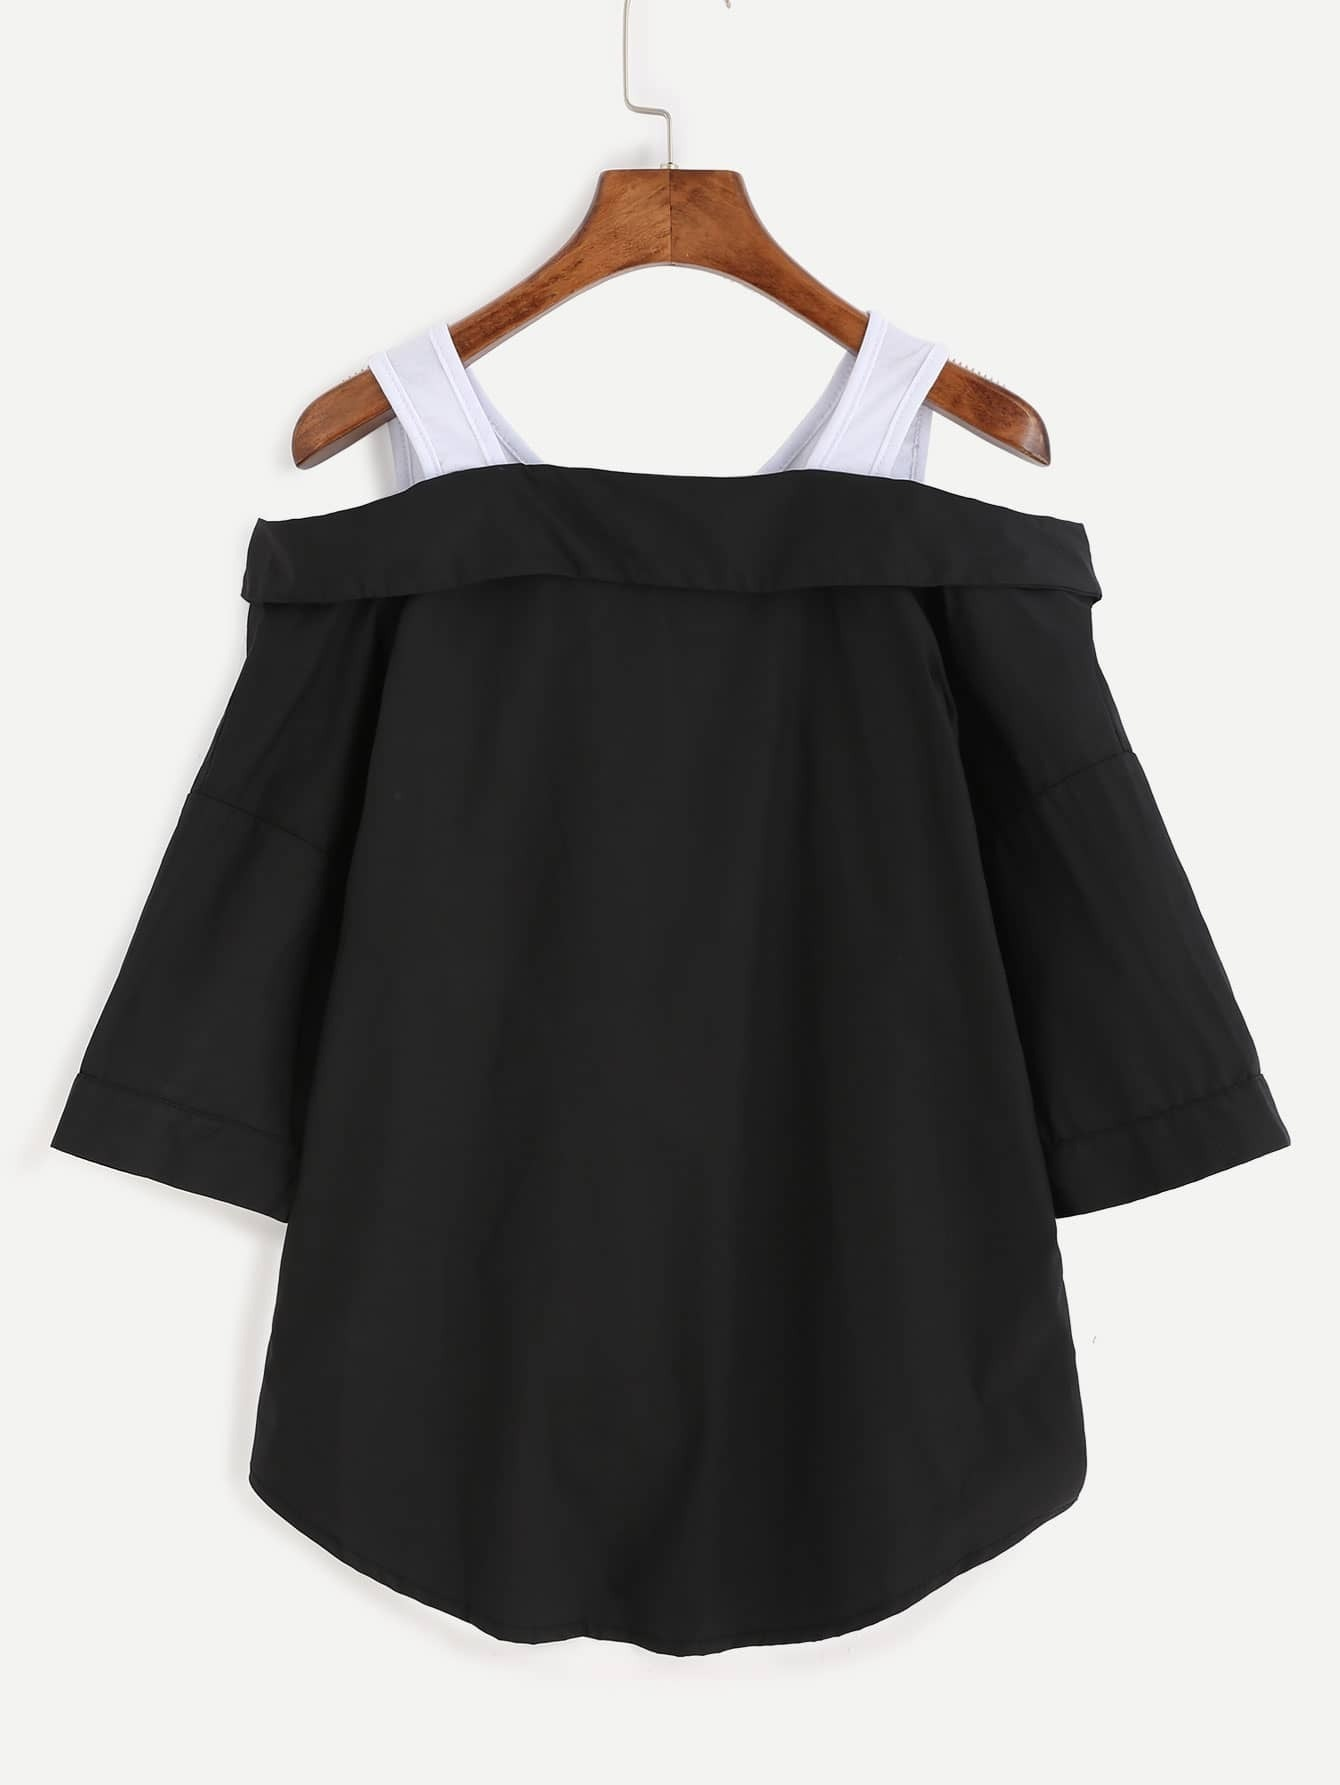 blouse160802134_2